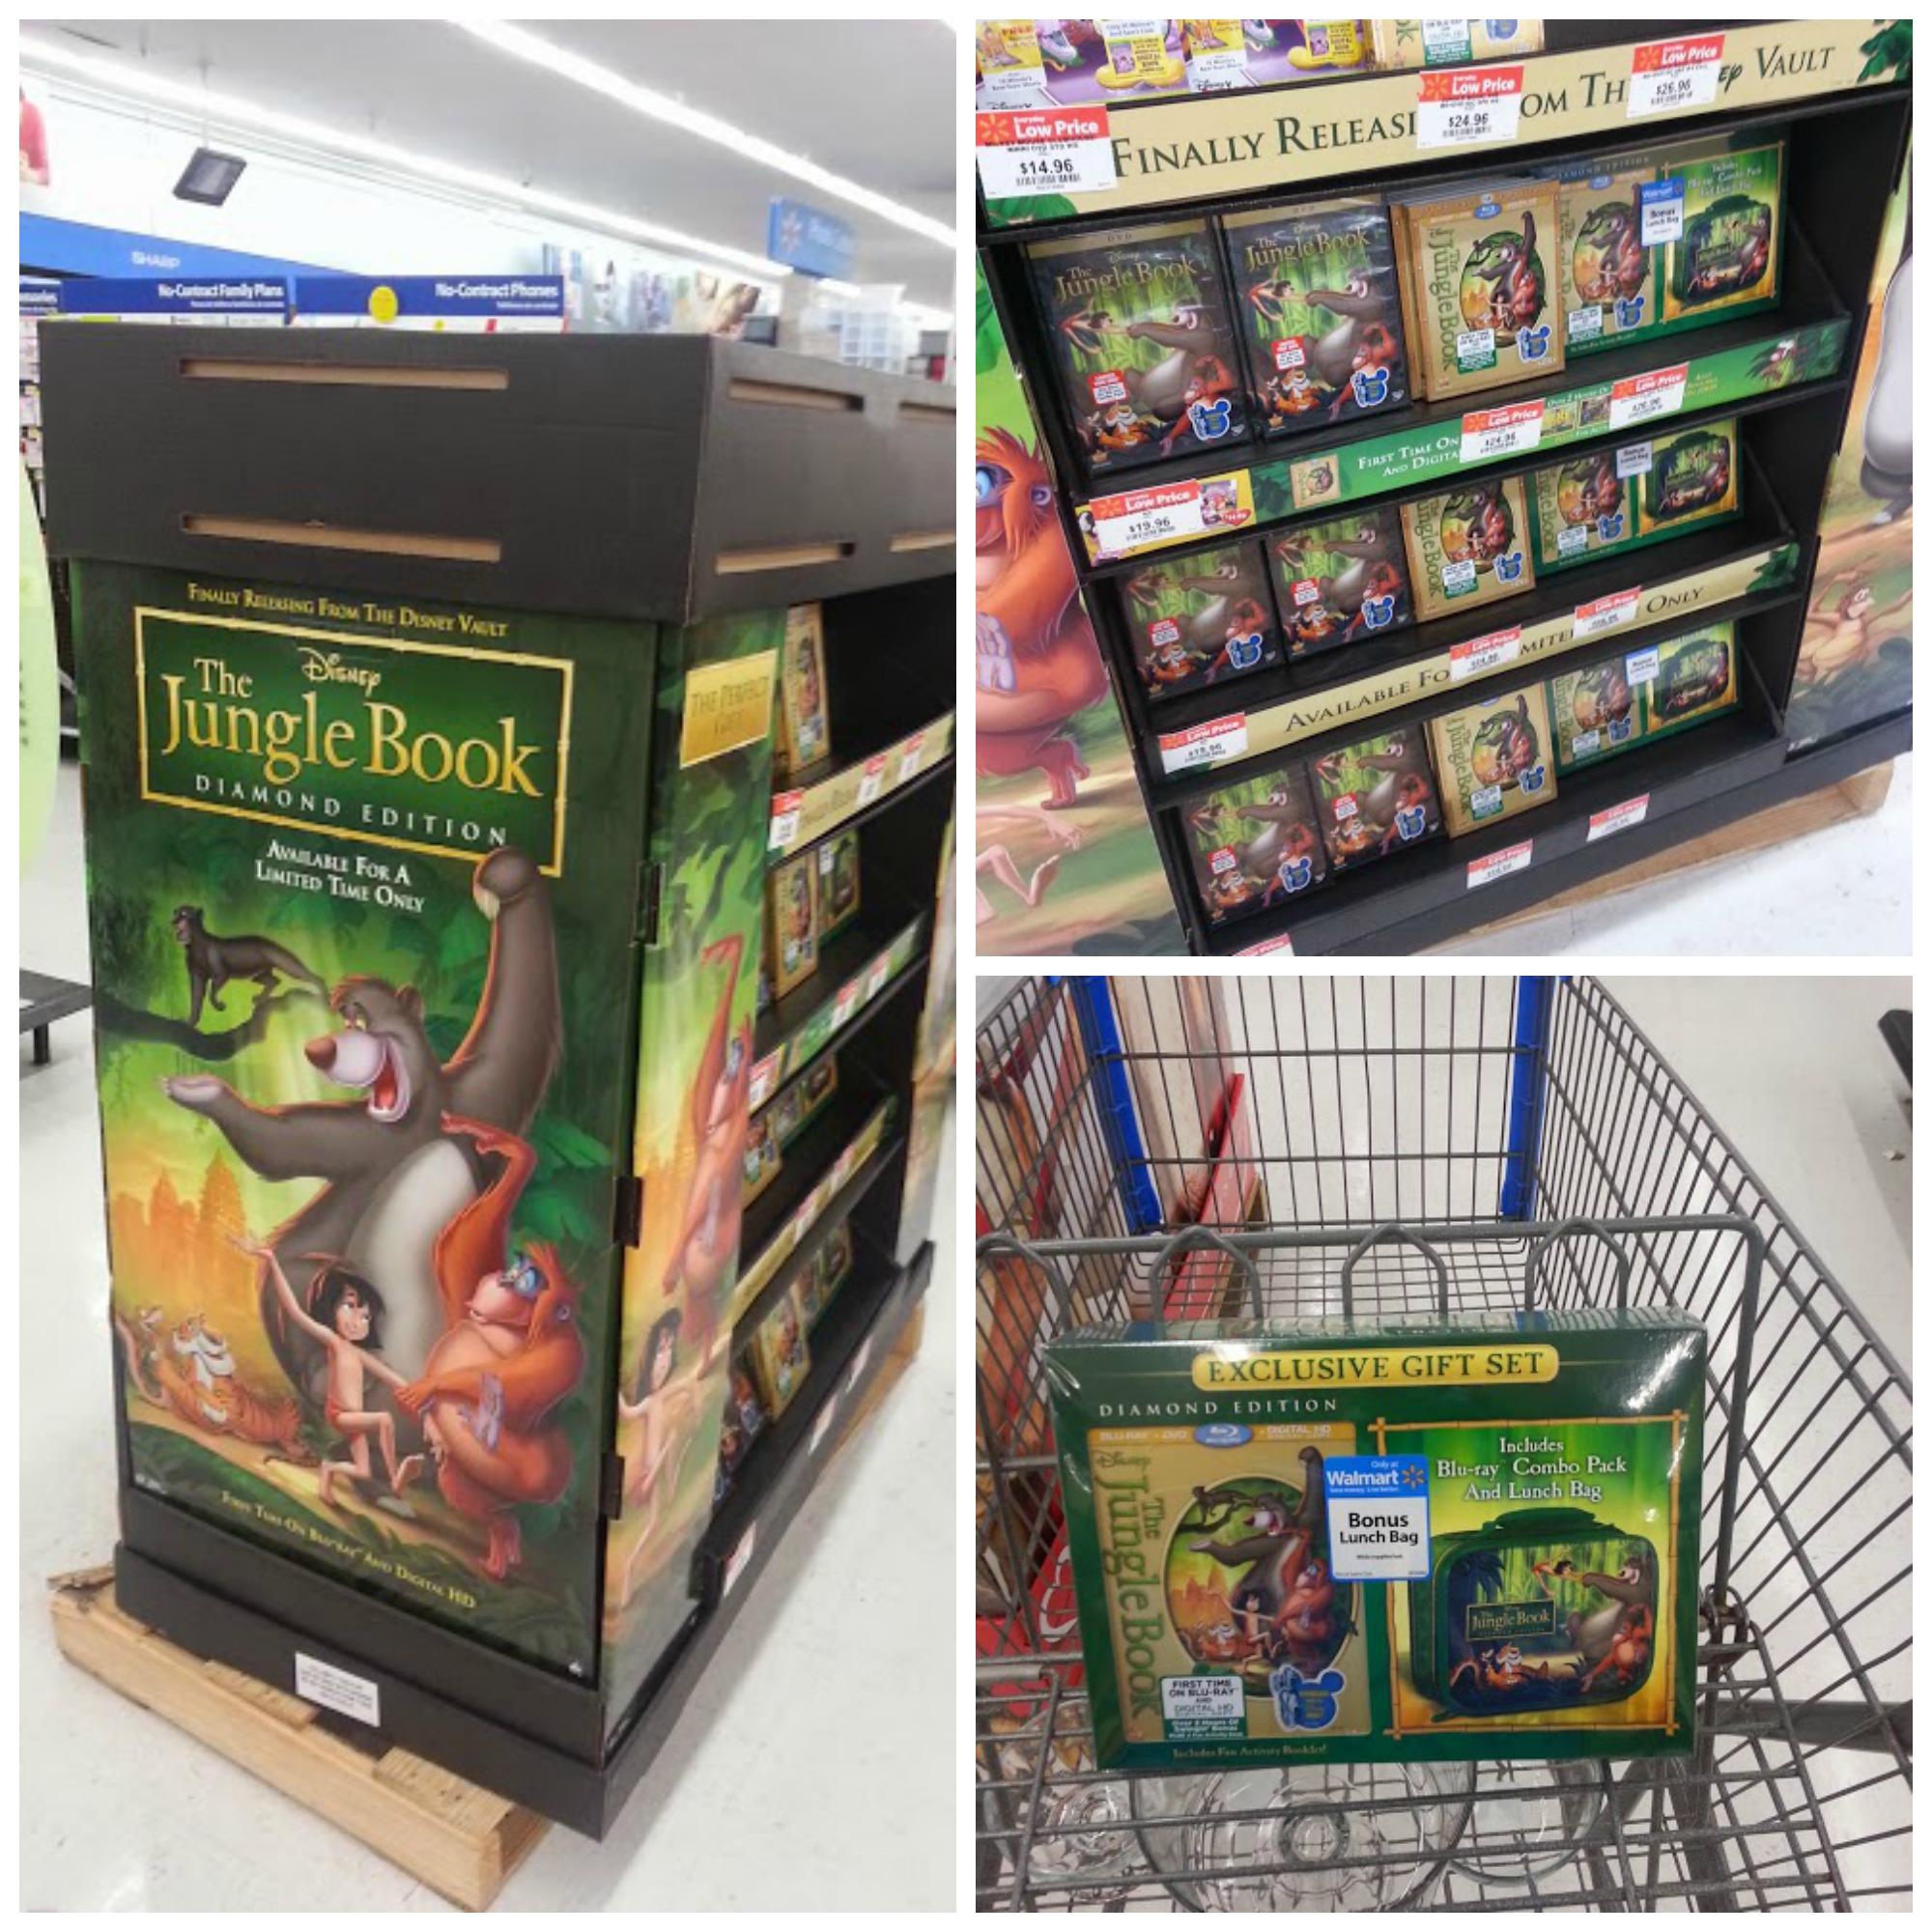 jungle book movi enight party #shop